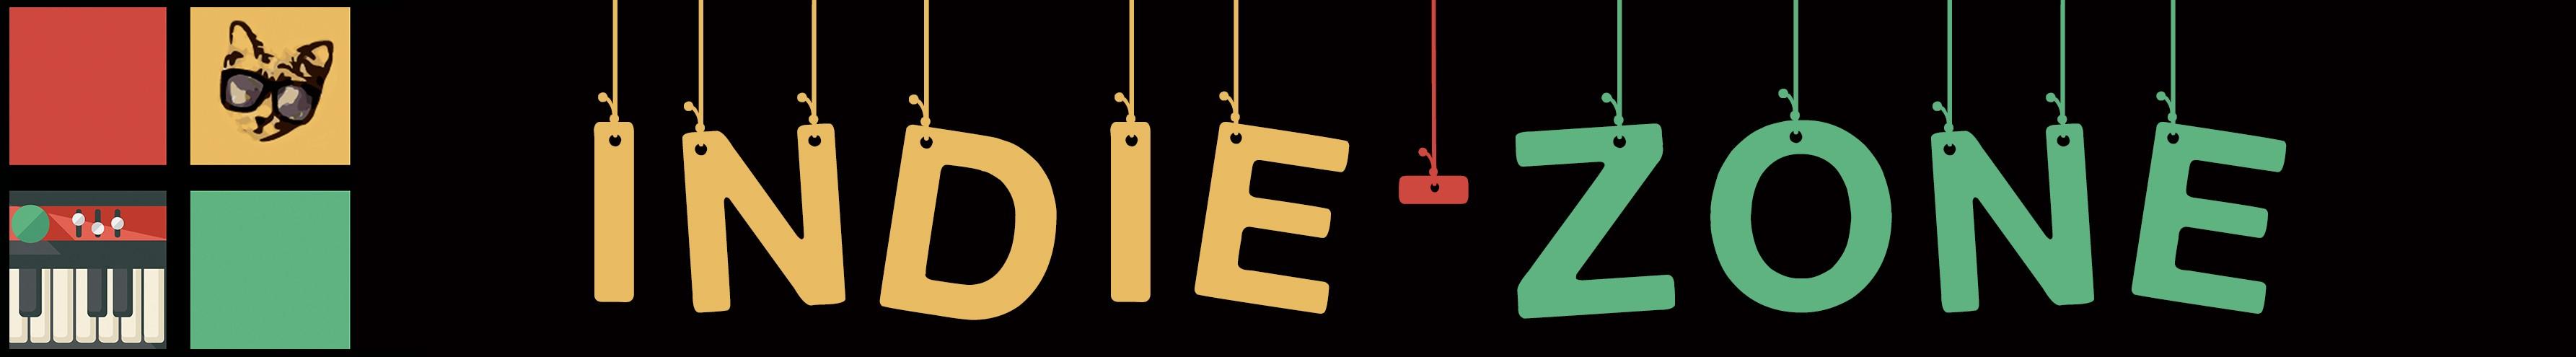 Indie-Zone logo